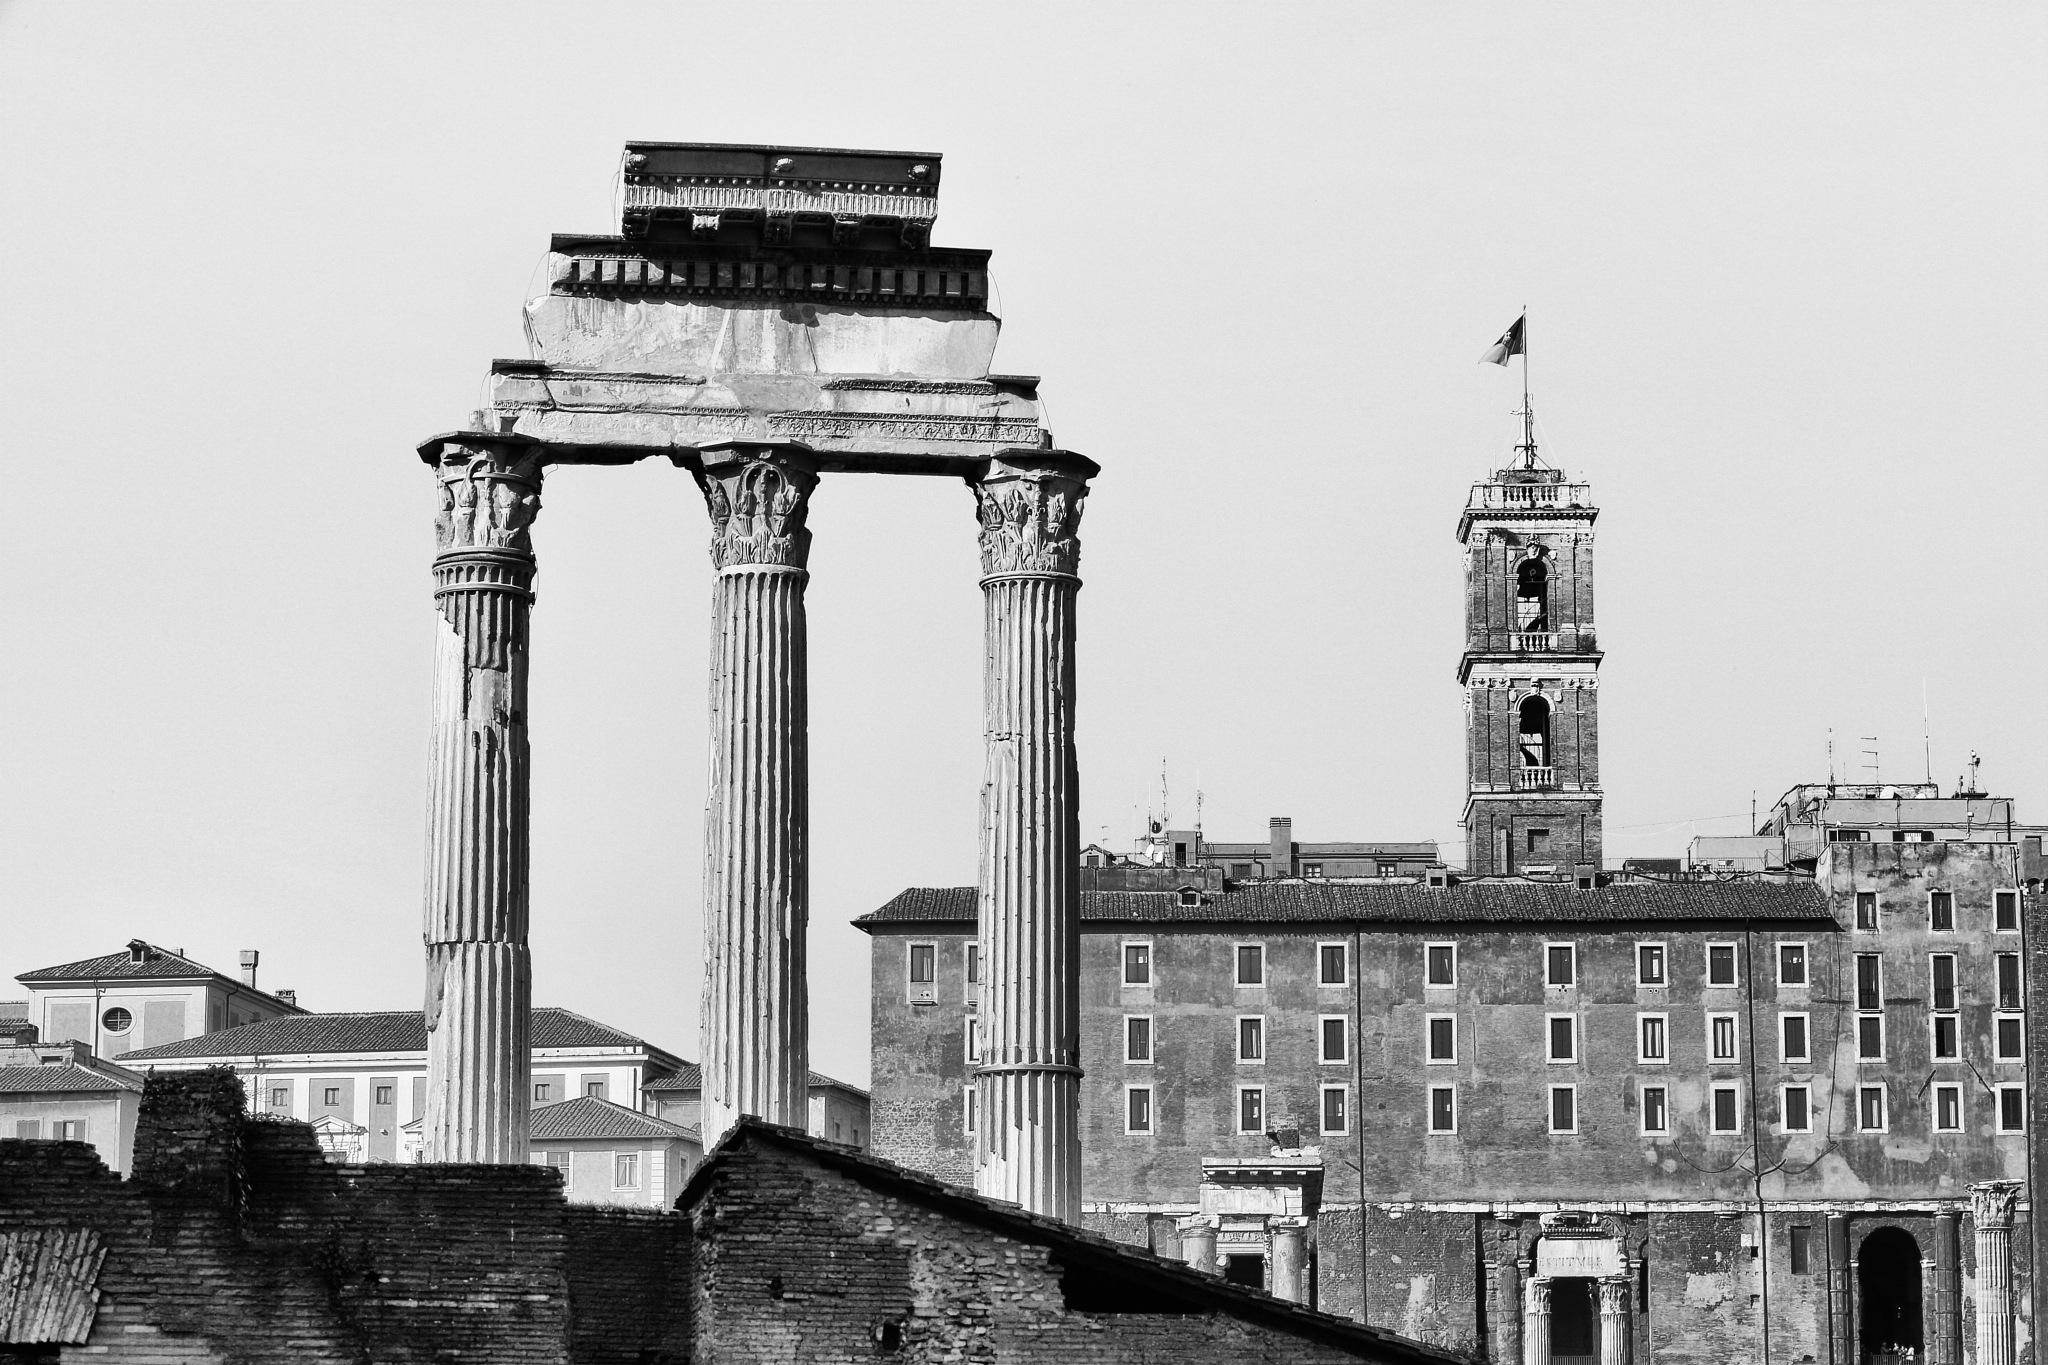 Monuments (Roman Forum) by leecj0129